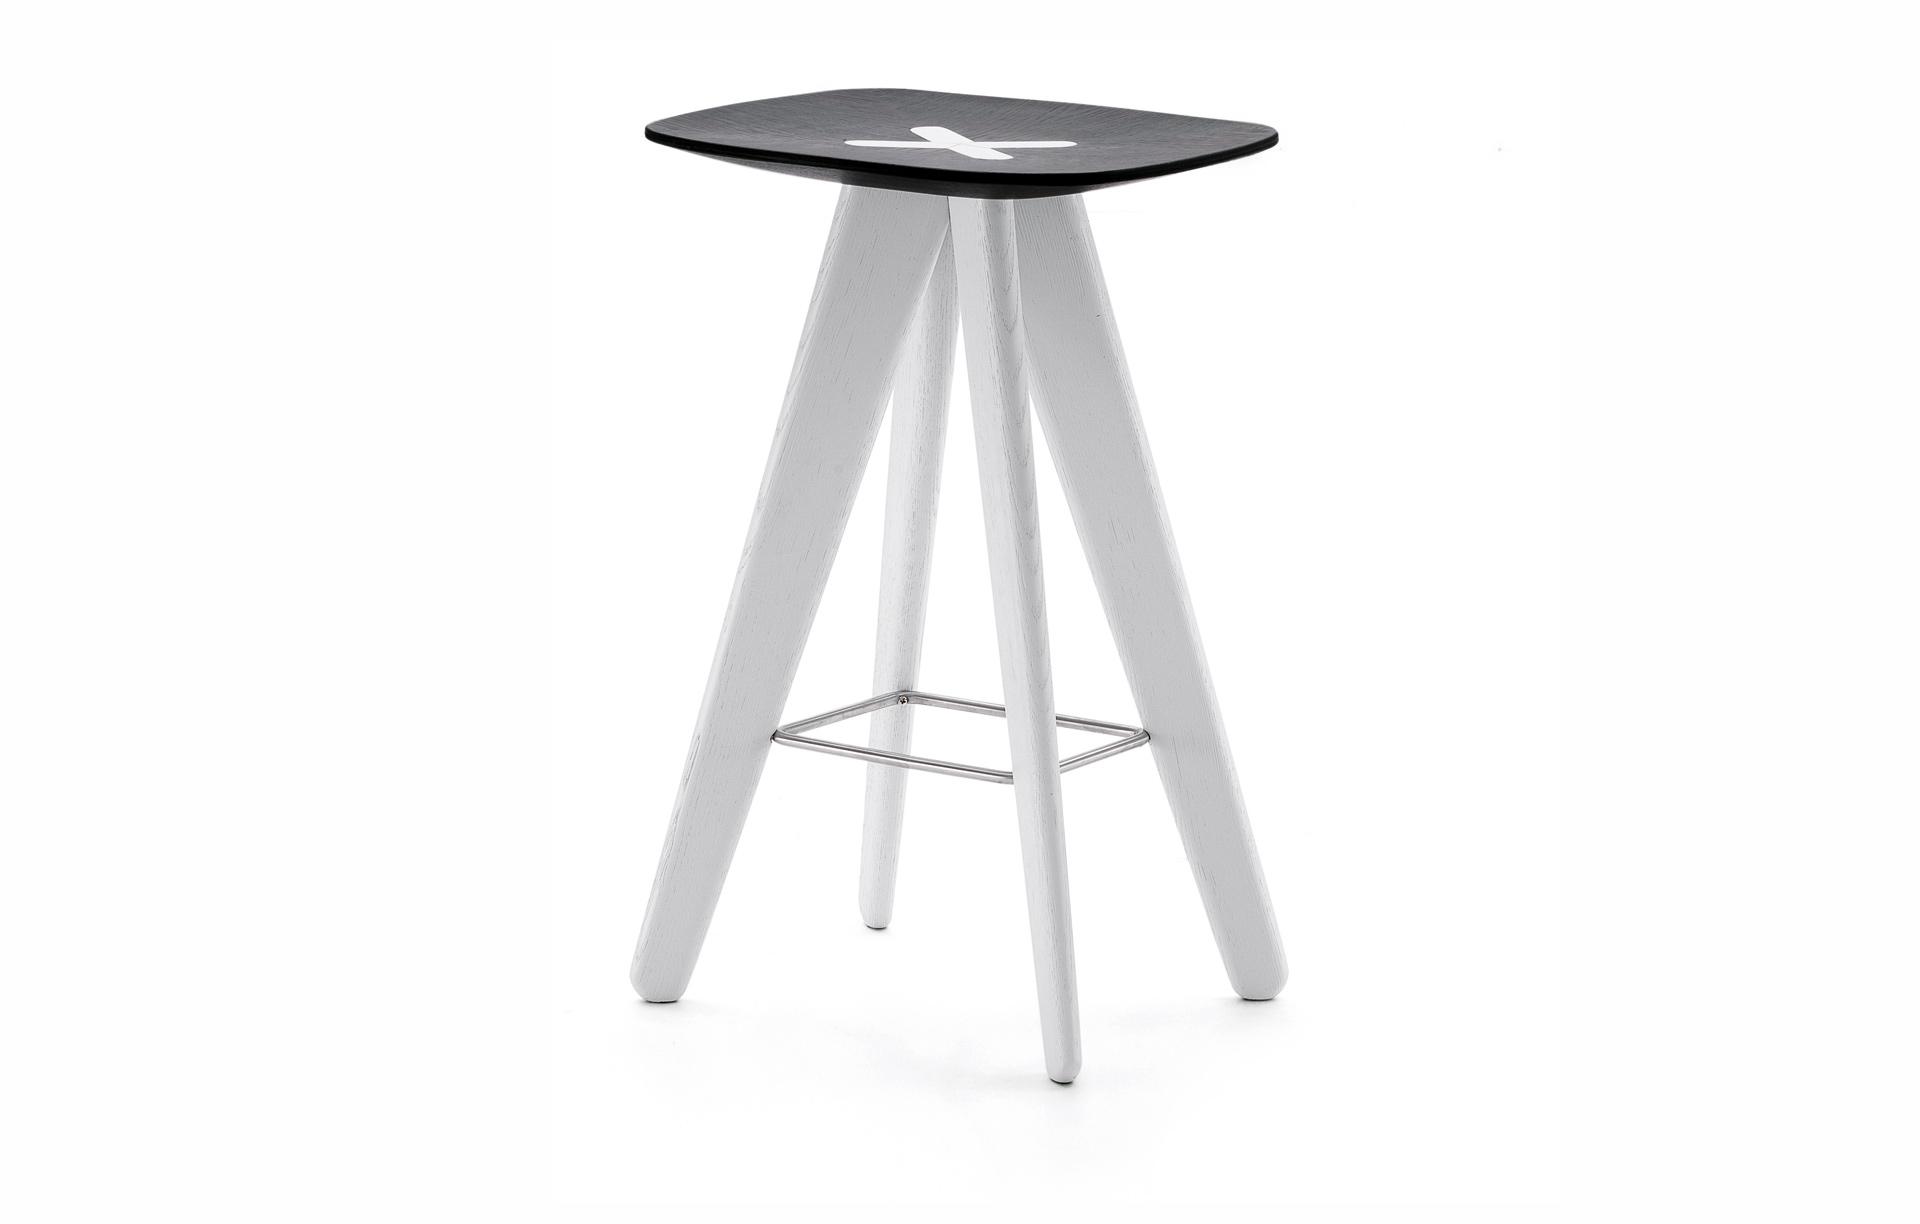 Home products chairs ics ipsilon - Ics Ipsilon By Poliform Furniture